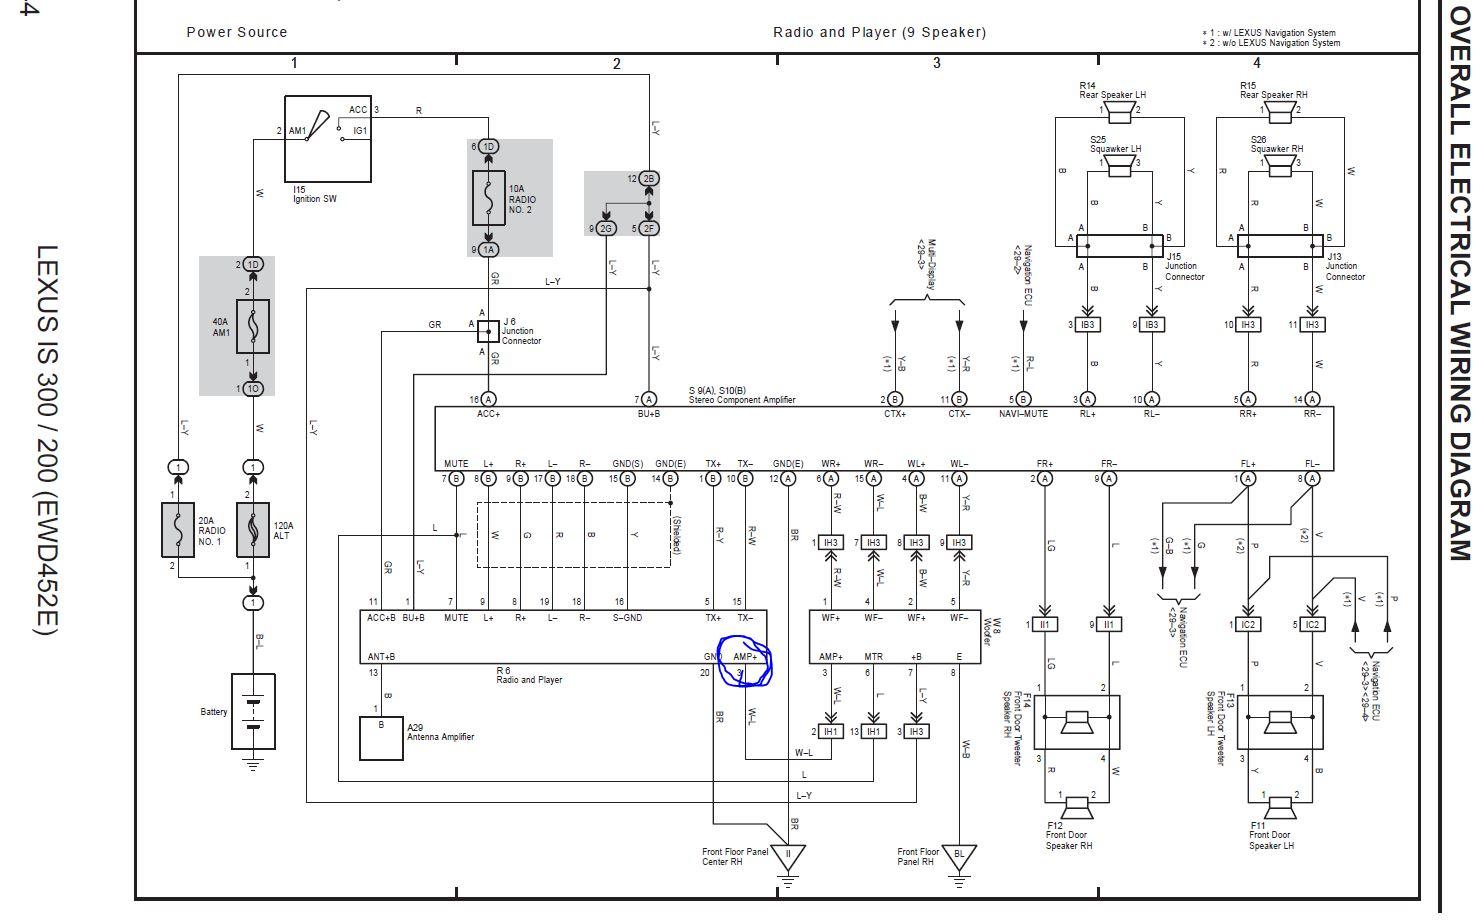 Sportcross Stereo Replacement Questions | Lexus IS Forum on amplifier circuit, amplifier power supply, amplifier installation, amplifier chassis, amplifier capacitor, circuit diagram, car stereo amp installation diagram, amplifier block diagram, amplifier parts, amplifier cable, amplifier schematic, bridging 4 channel amp diagram, amplifier cooling system, amplifier speaker, simple amplifier diagram,